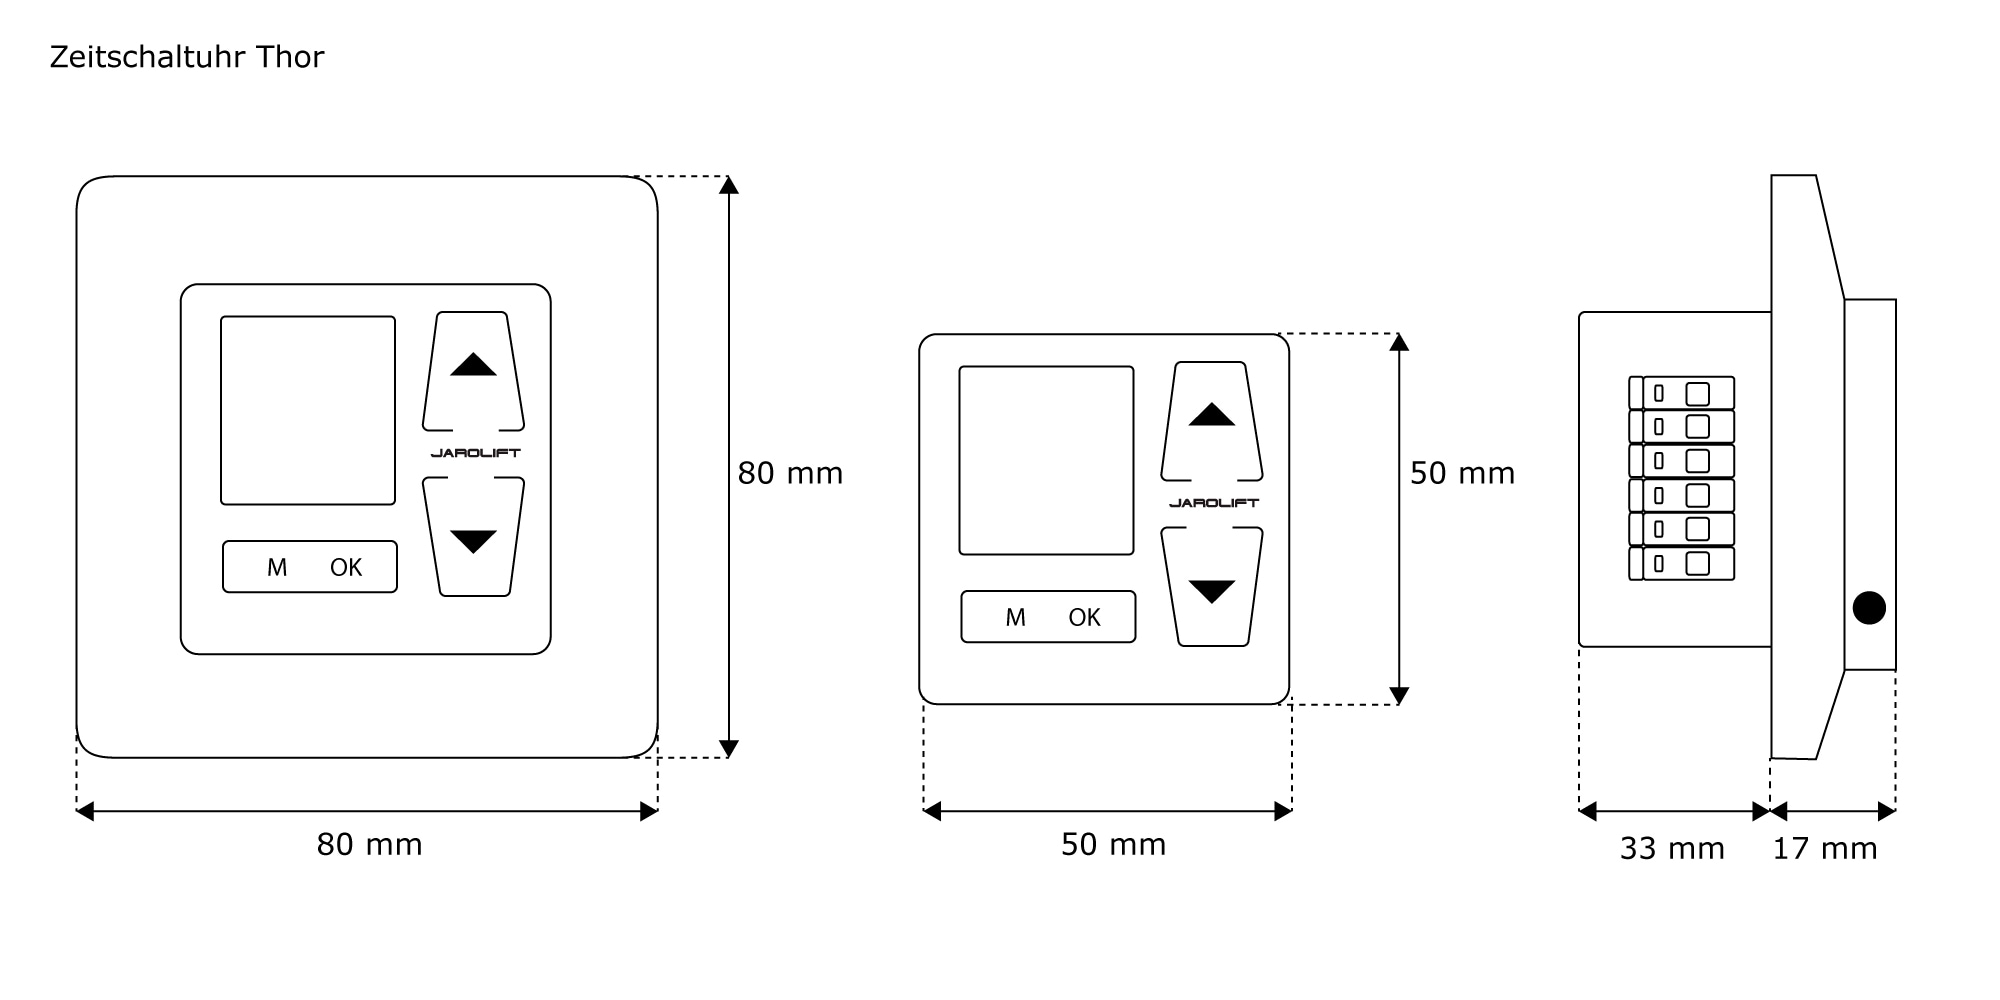 jarolift rolladen thor zeitschaltuhr 1 50m sensor 4251043665800 ebay. Black Bedroom Furniture Sets. Home Design Ideas